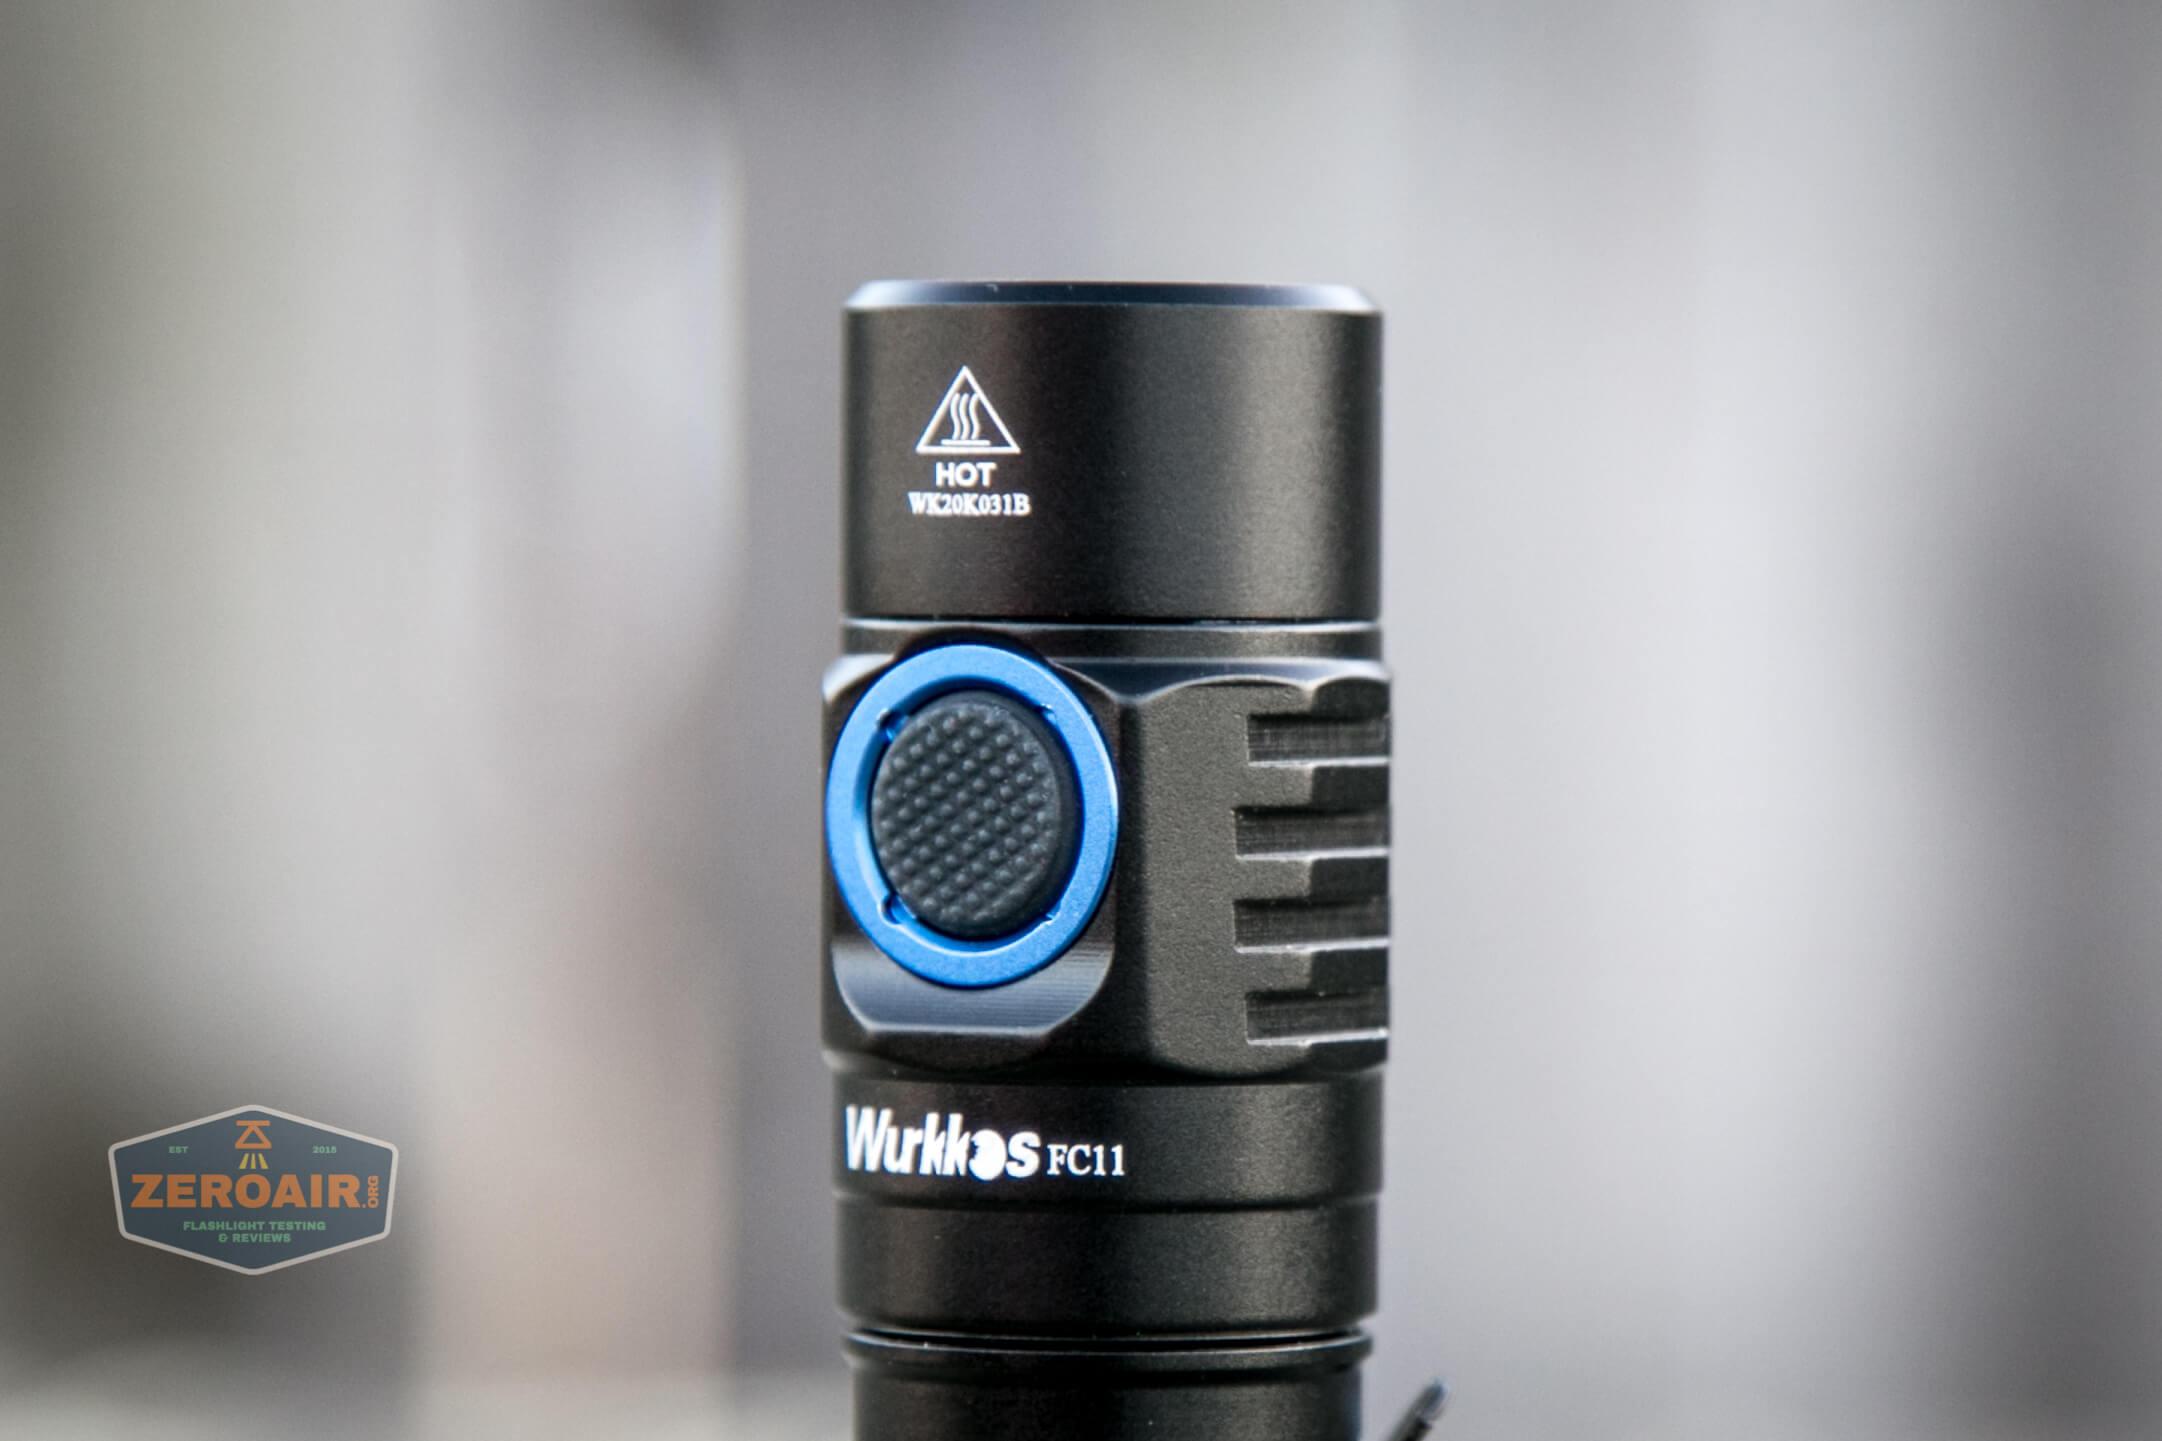 wurkkos fc11 flashlight switch profile